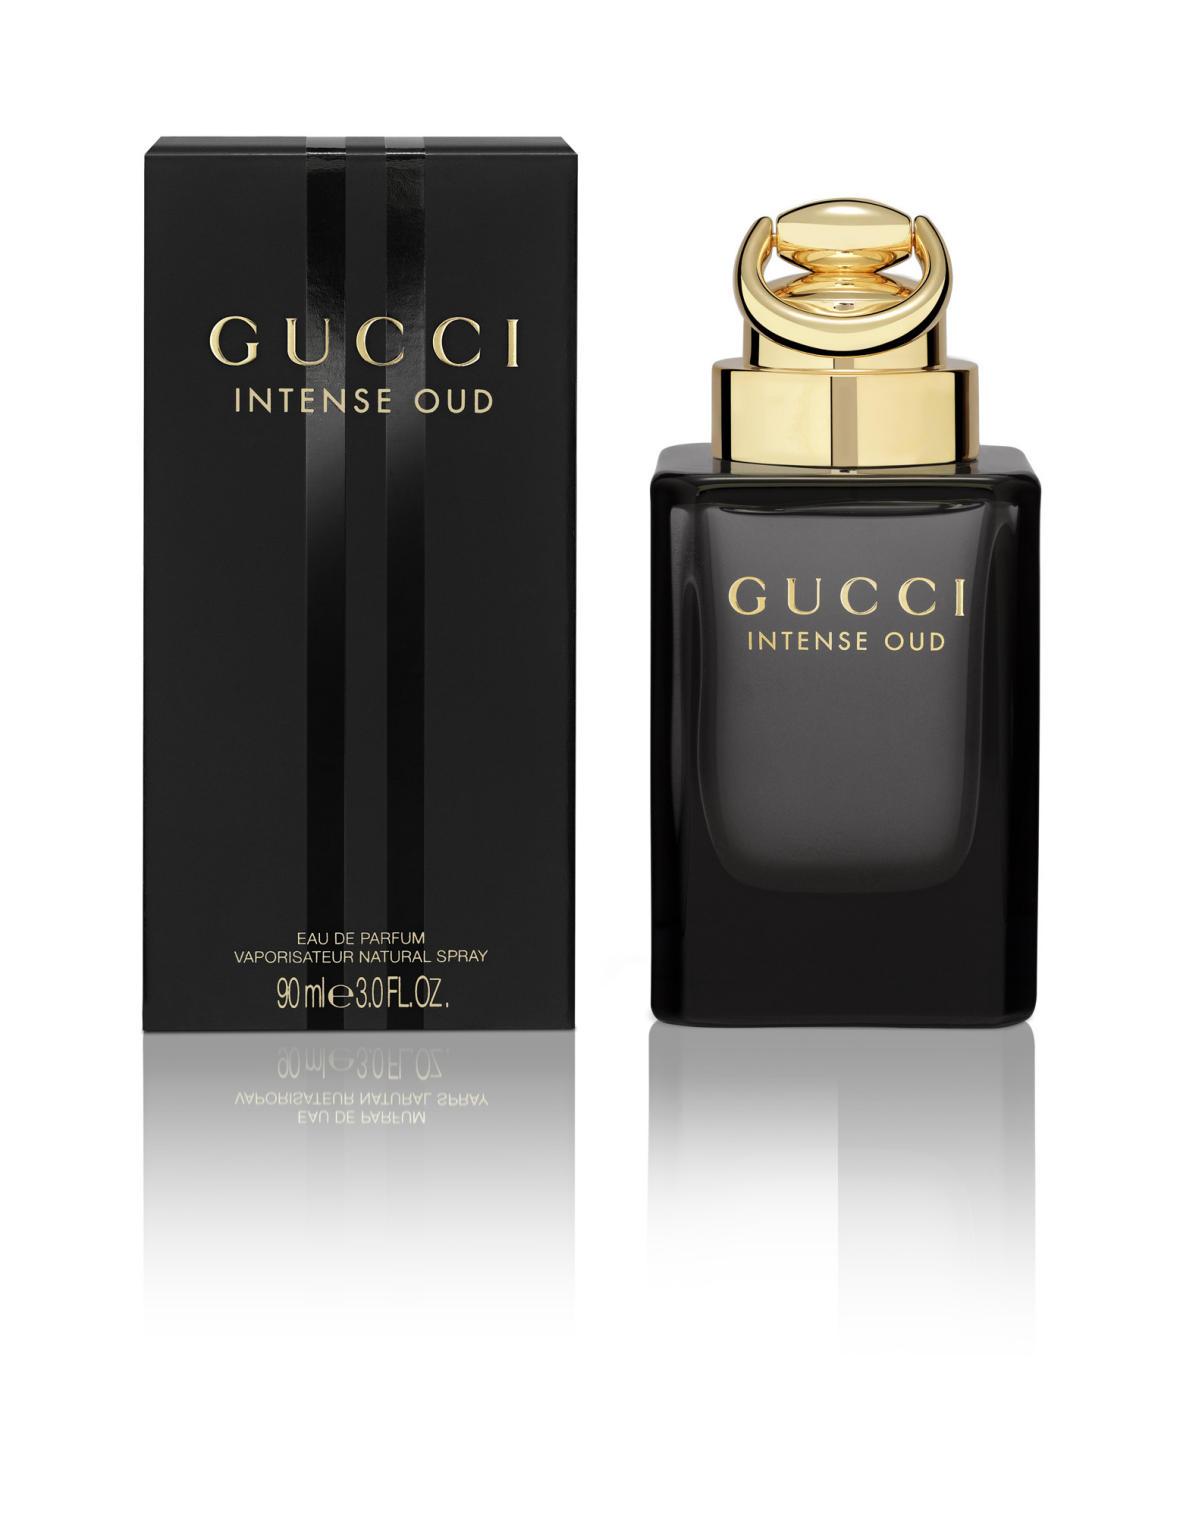 Perfume Gucci. Be charming